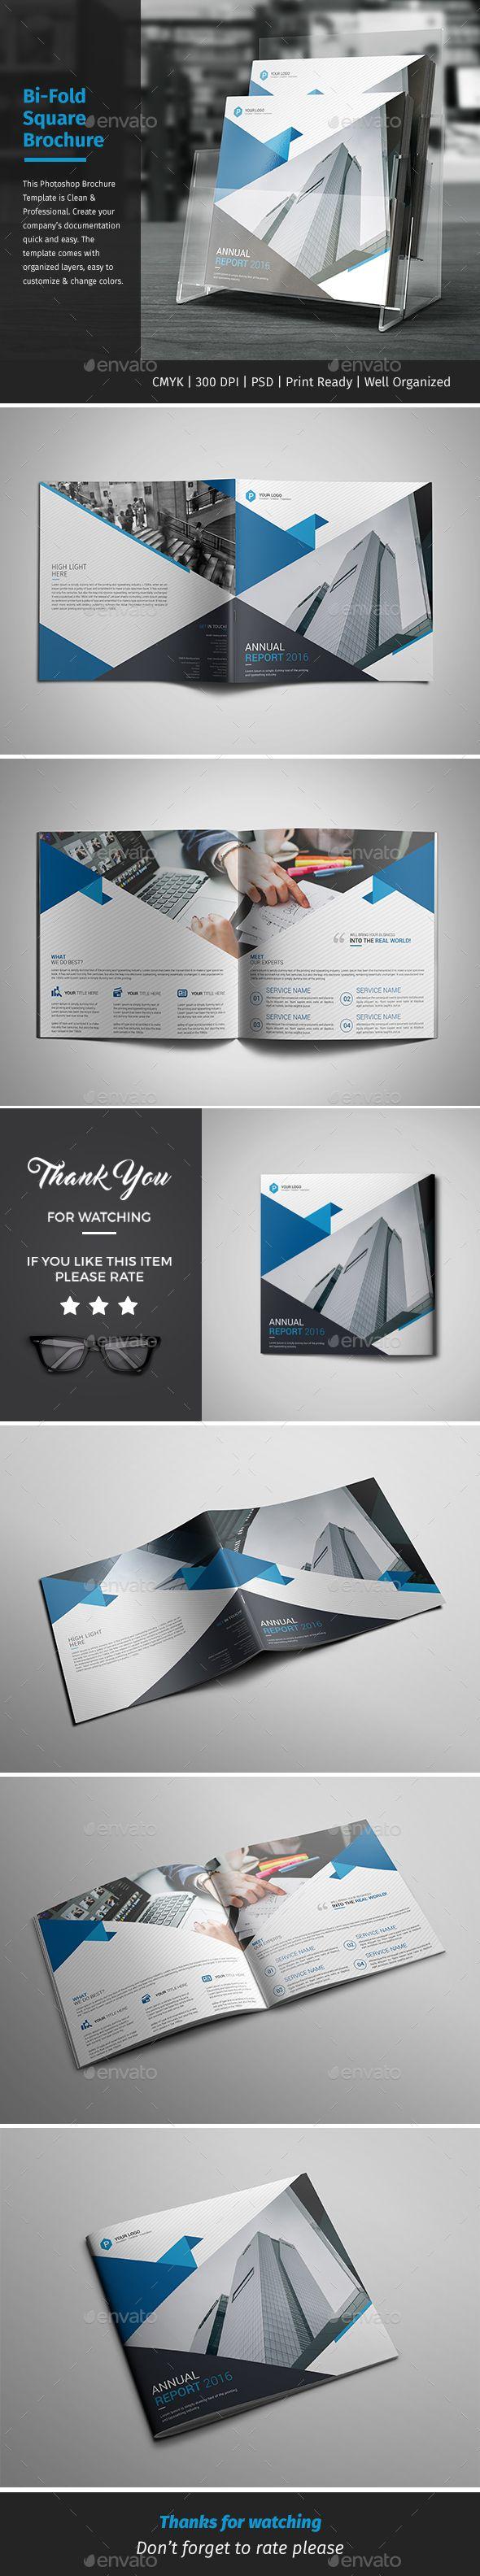 Corporate Bi-fold Square Brochure Template PSD. Download here: http://graphicriver.net/item/corporate-bifold-square-brochure-10/16668484?ref=ksioks